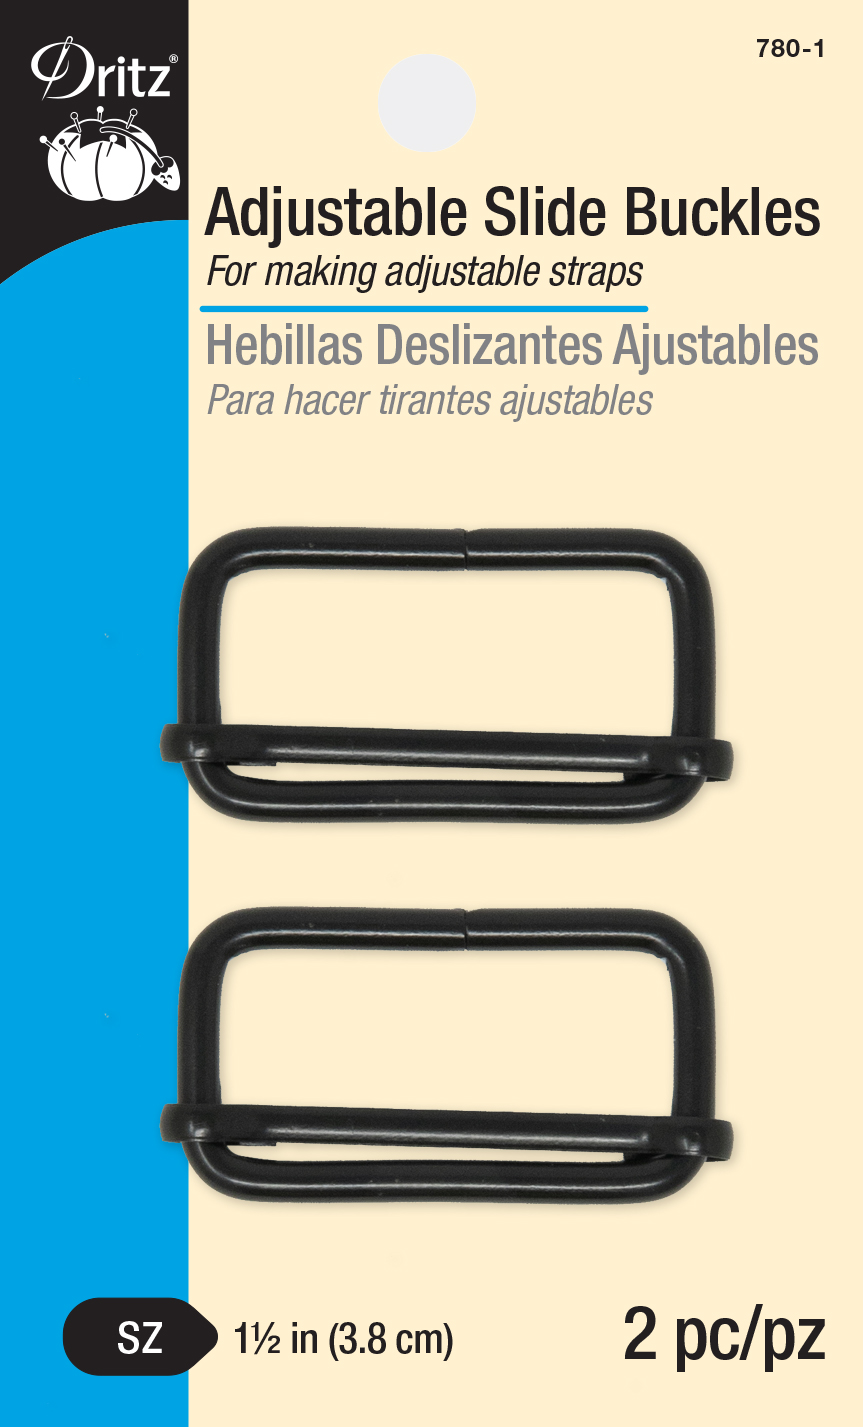 Adjustable Slide Buckles - Black-780-1